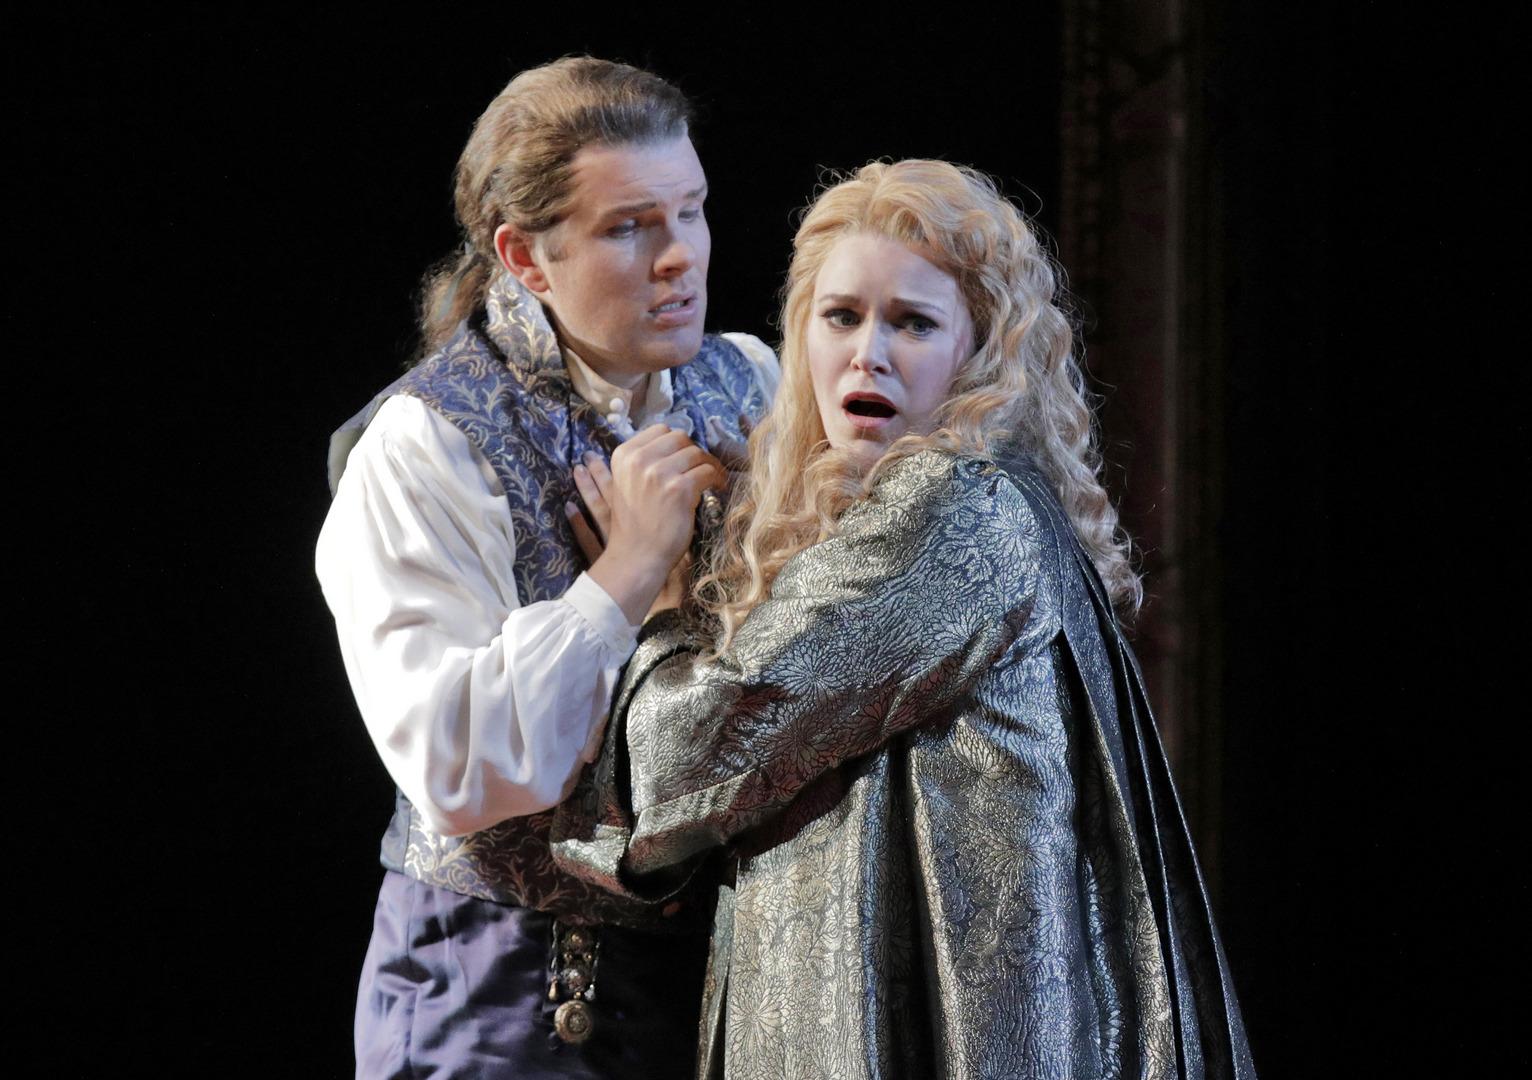 Opera-Director-Jacopo-Spirei-Don-Giovanni-Opera-by-Mozart-San-Francisco-2017-2